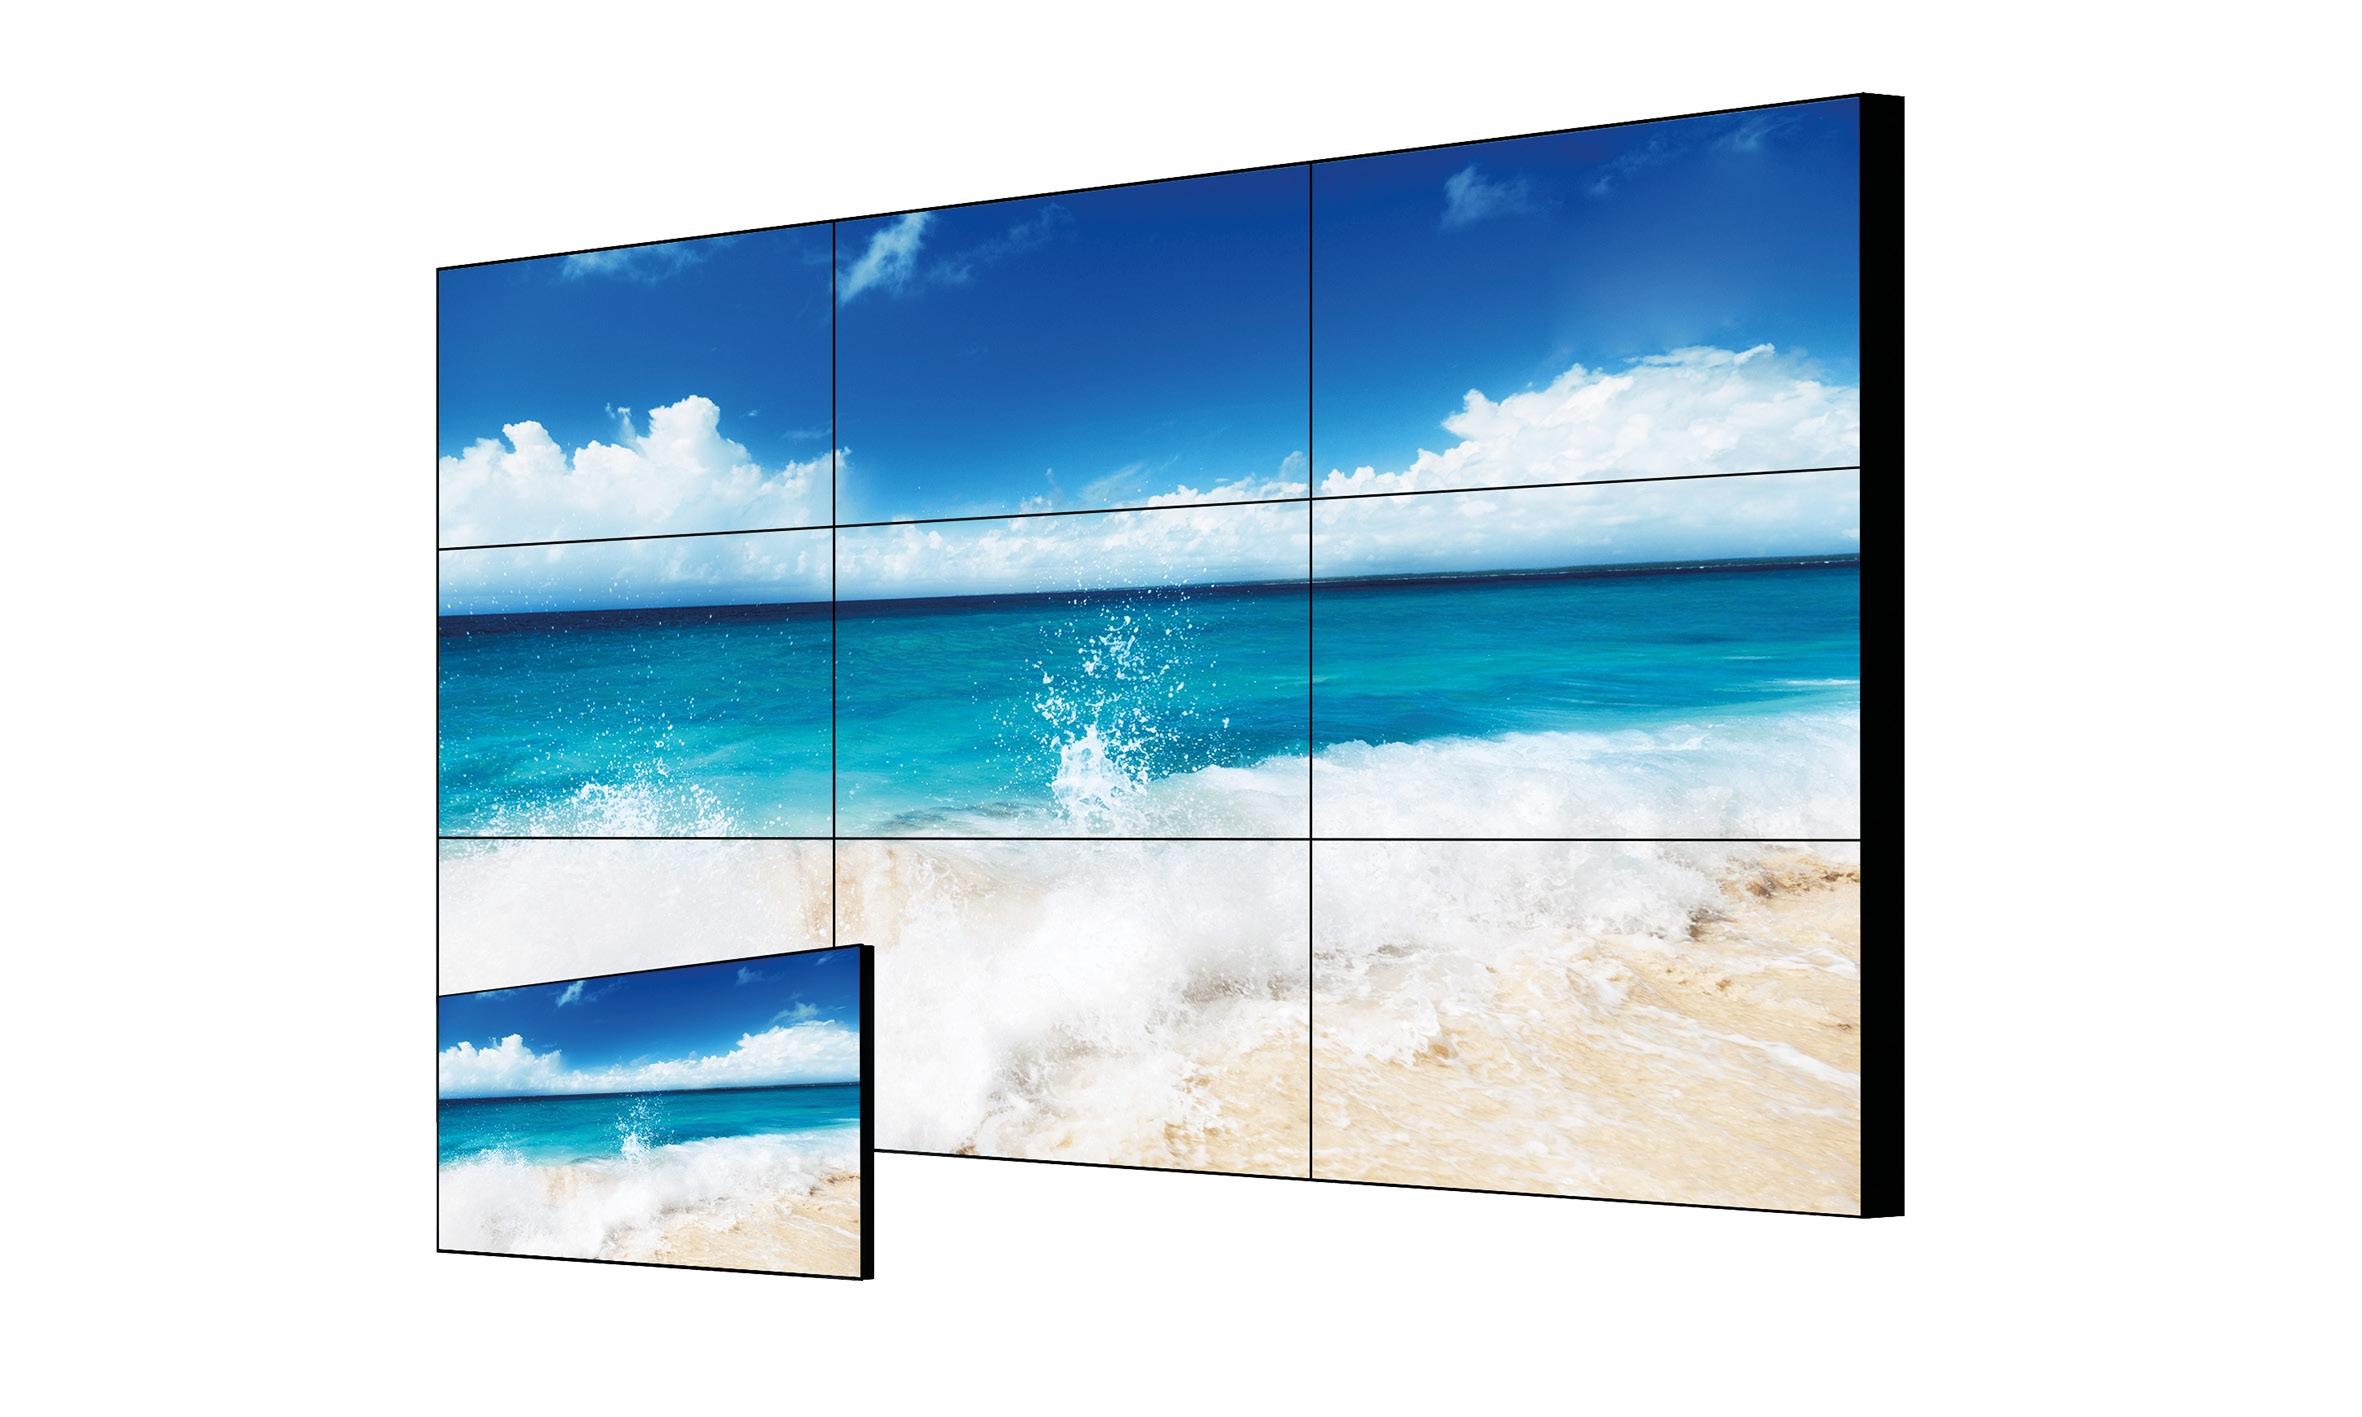 FHD Video Wall Display